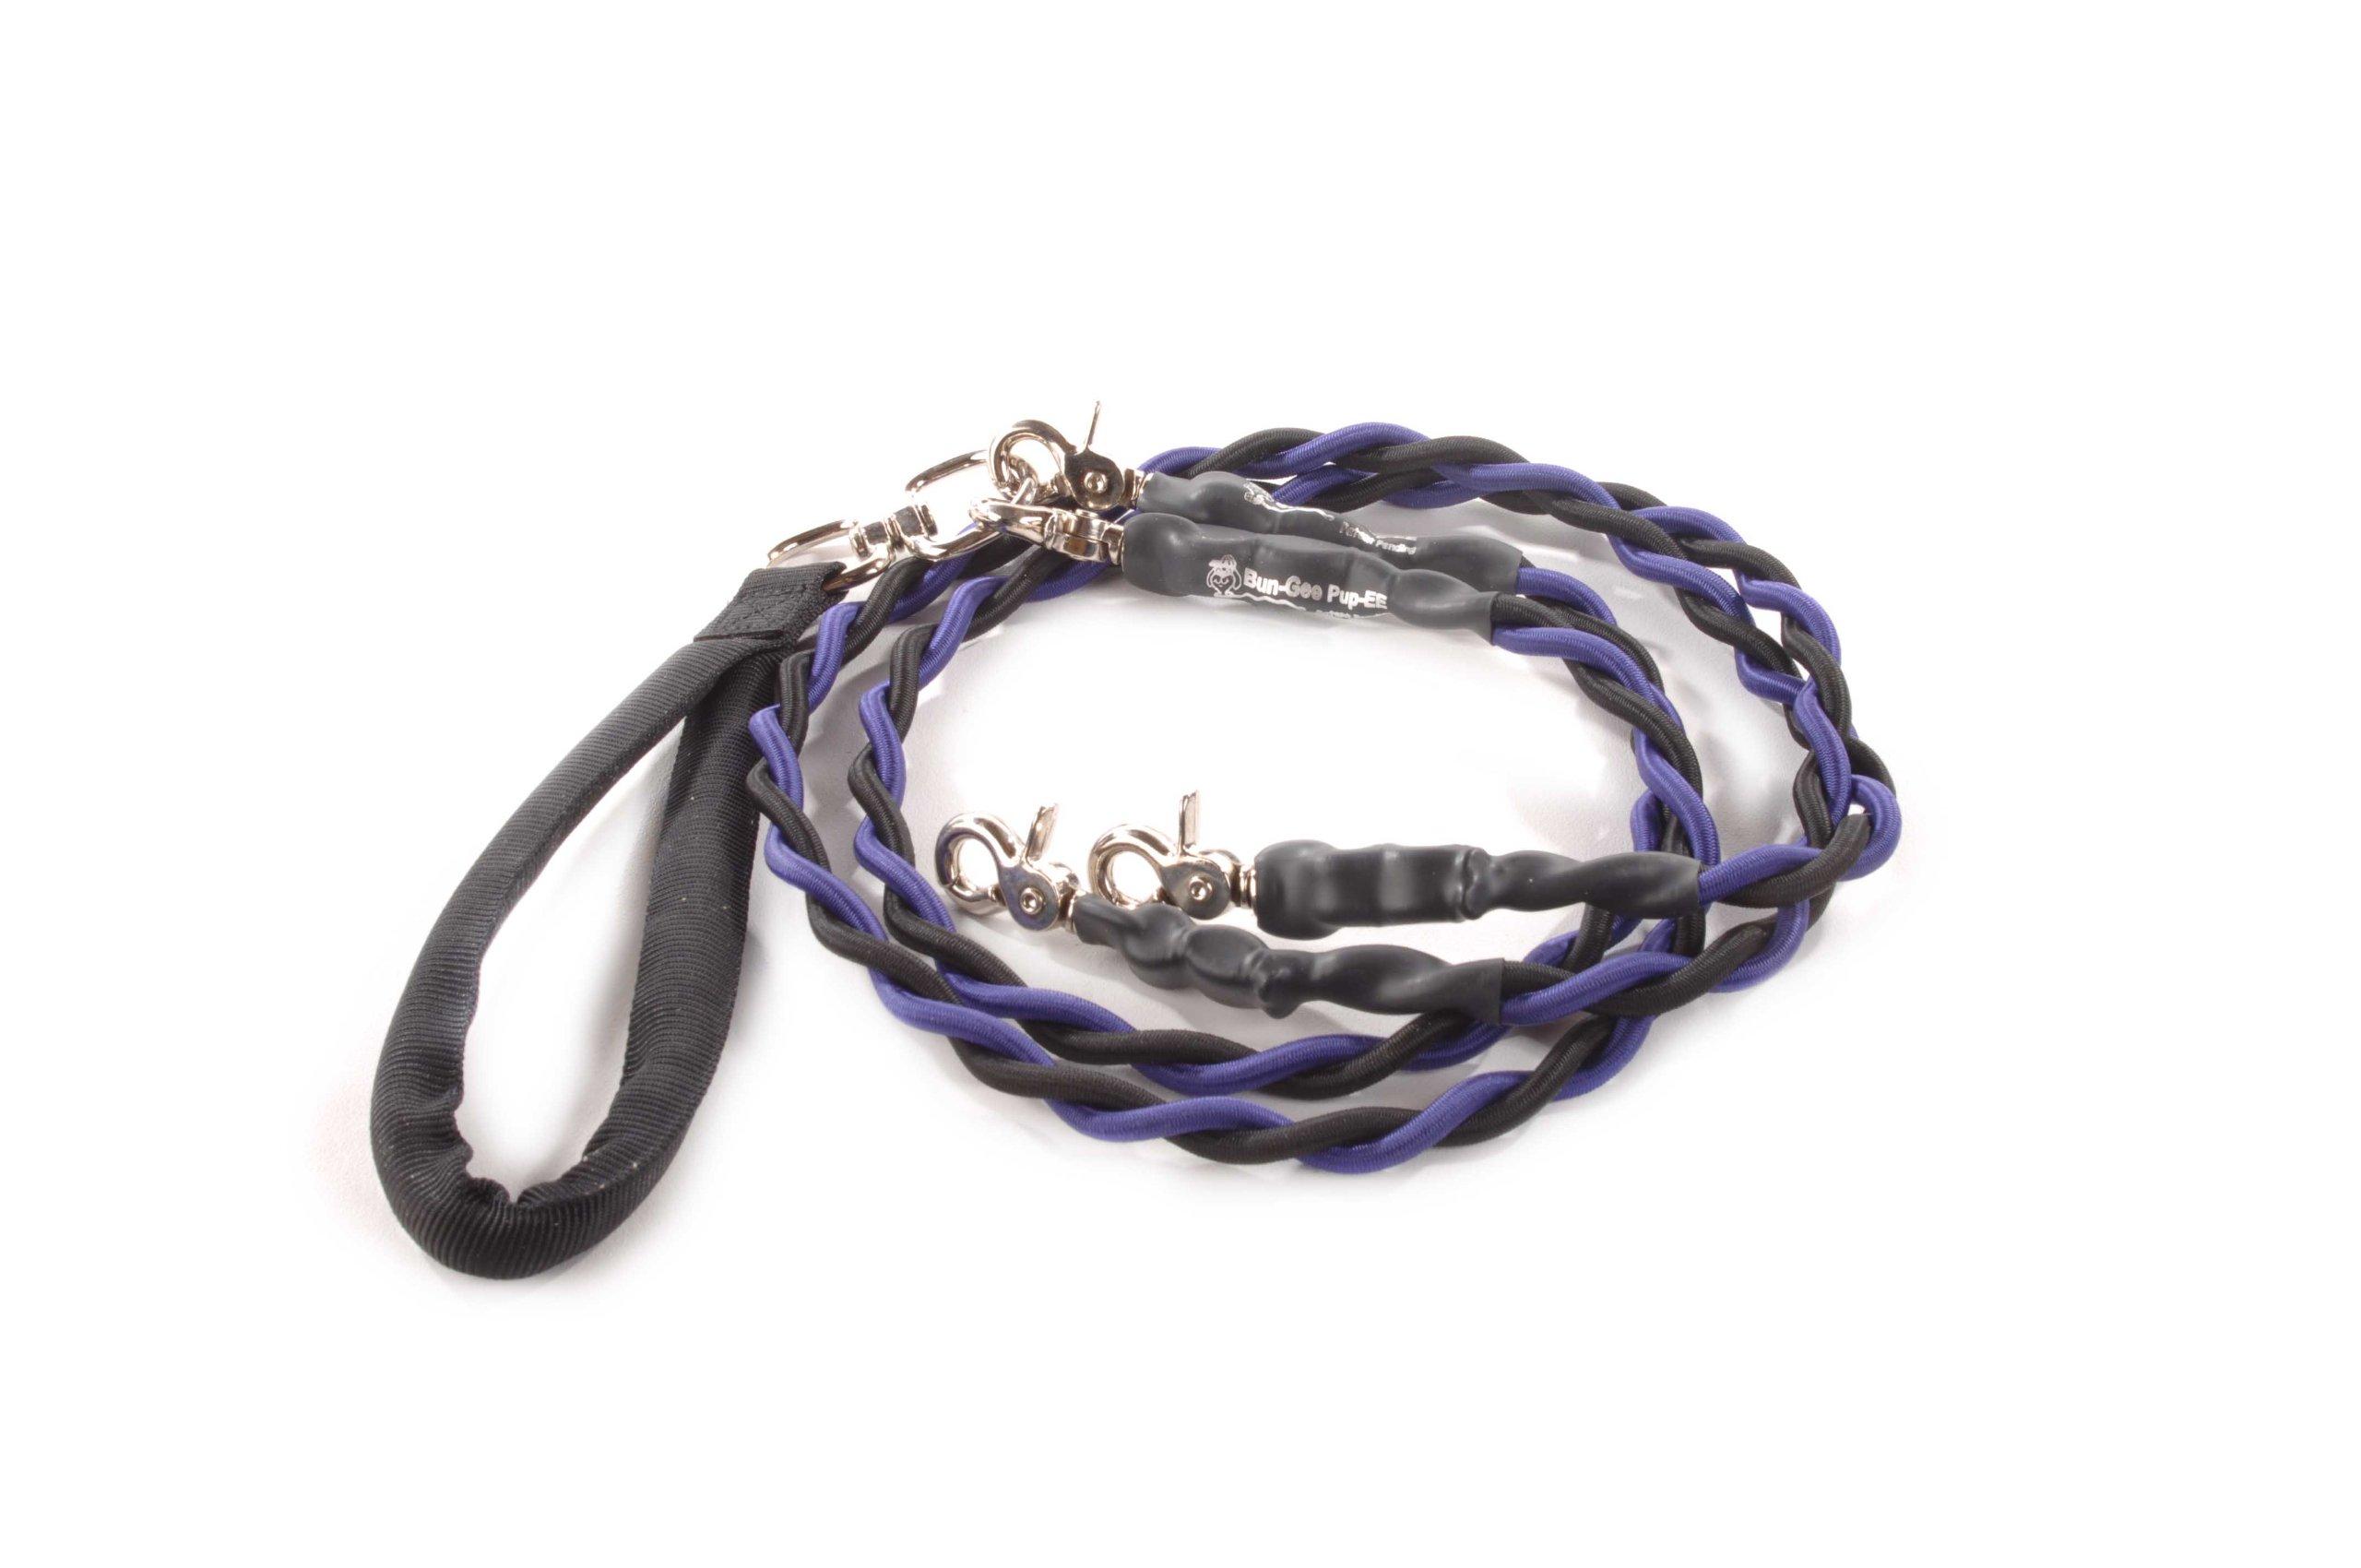 Bungee Pupee 4-Feet Double Pet Leash for Medium Sized Dogs, Purple/Black by Bungee Pupee